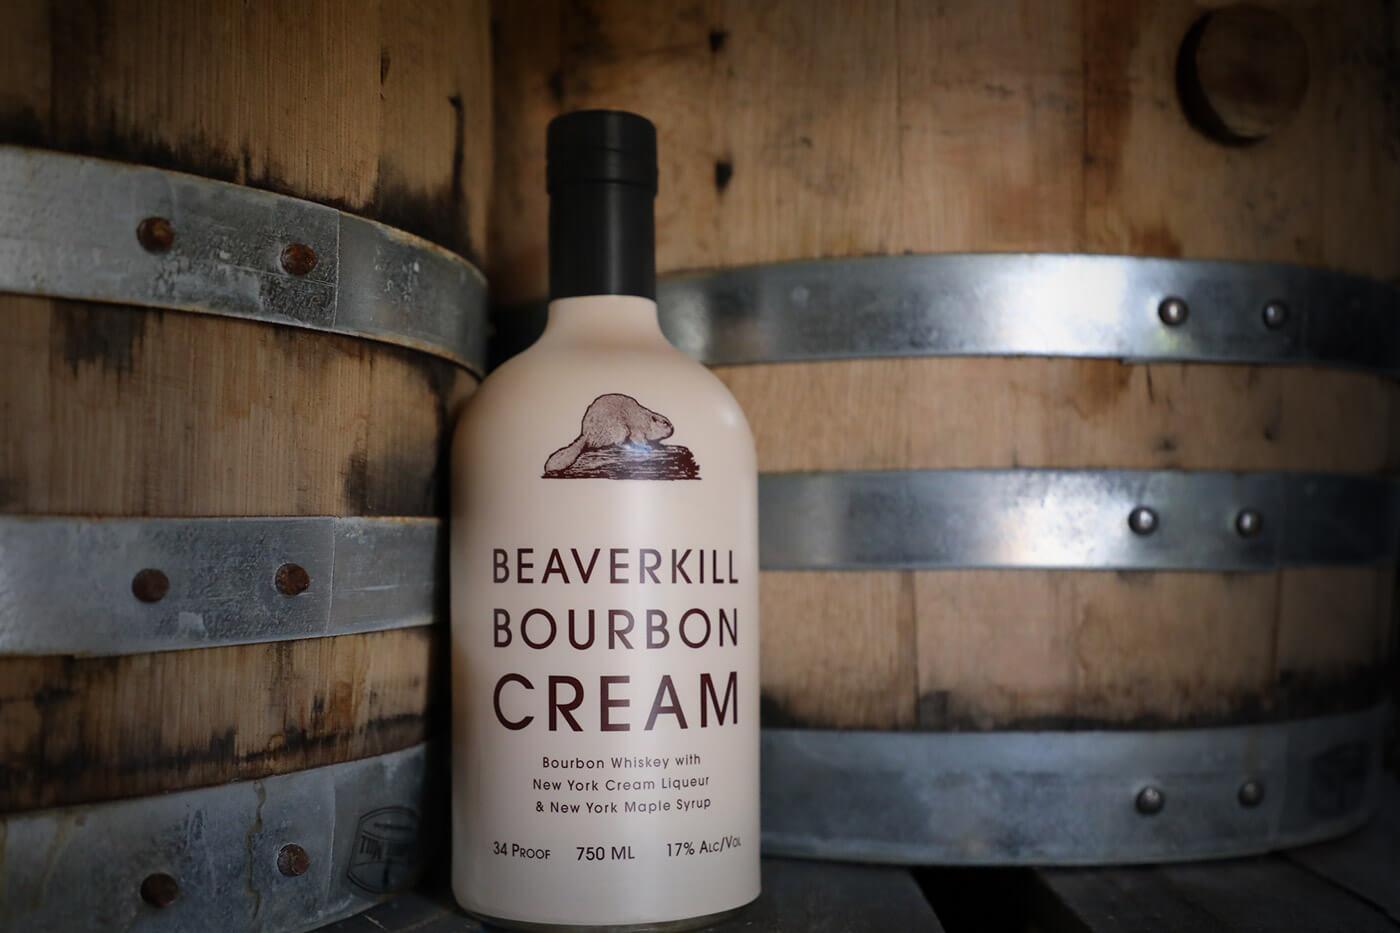 Beaverkill Bourbon Cream